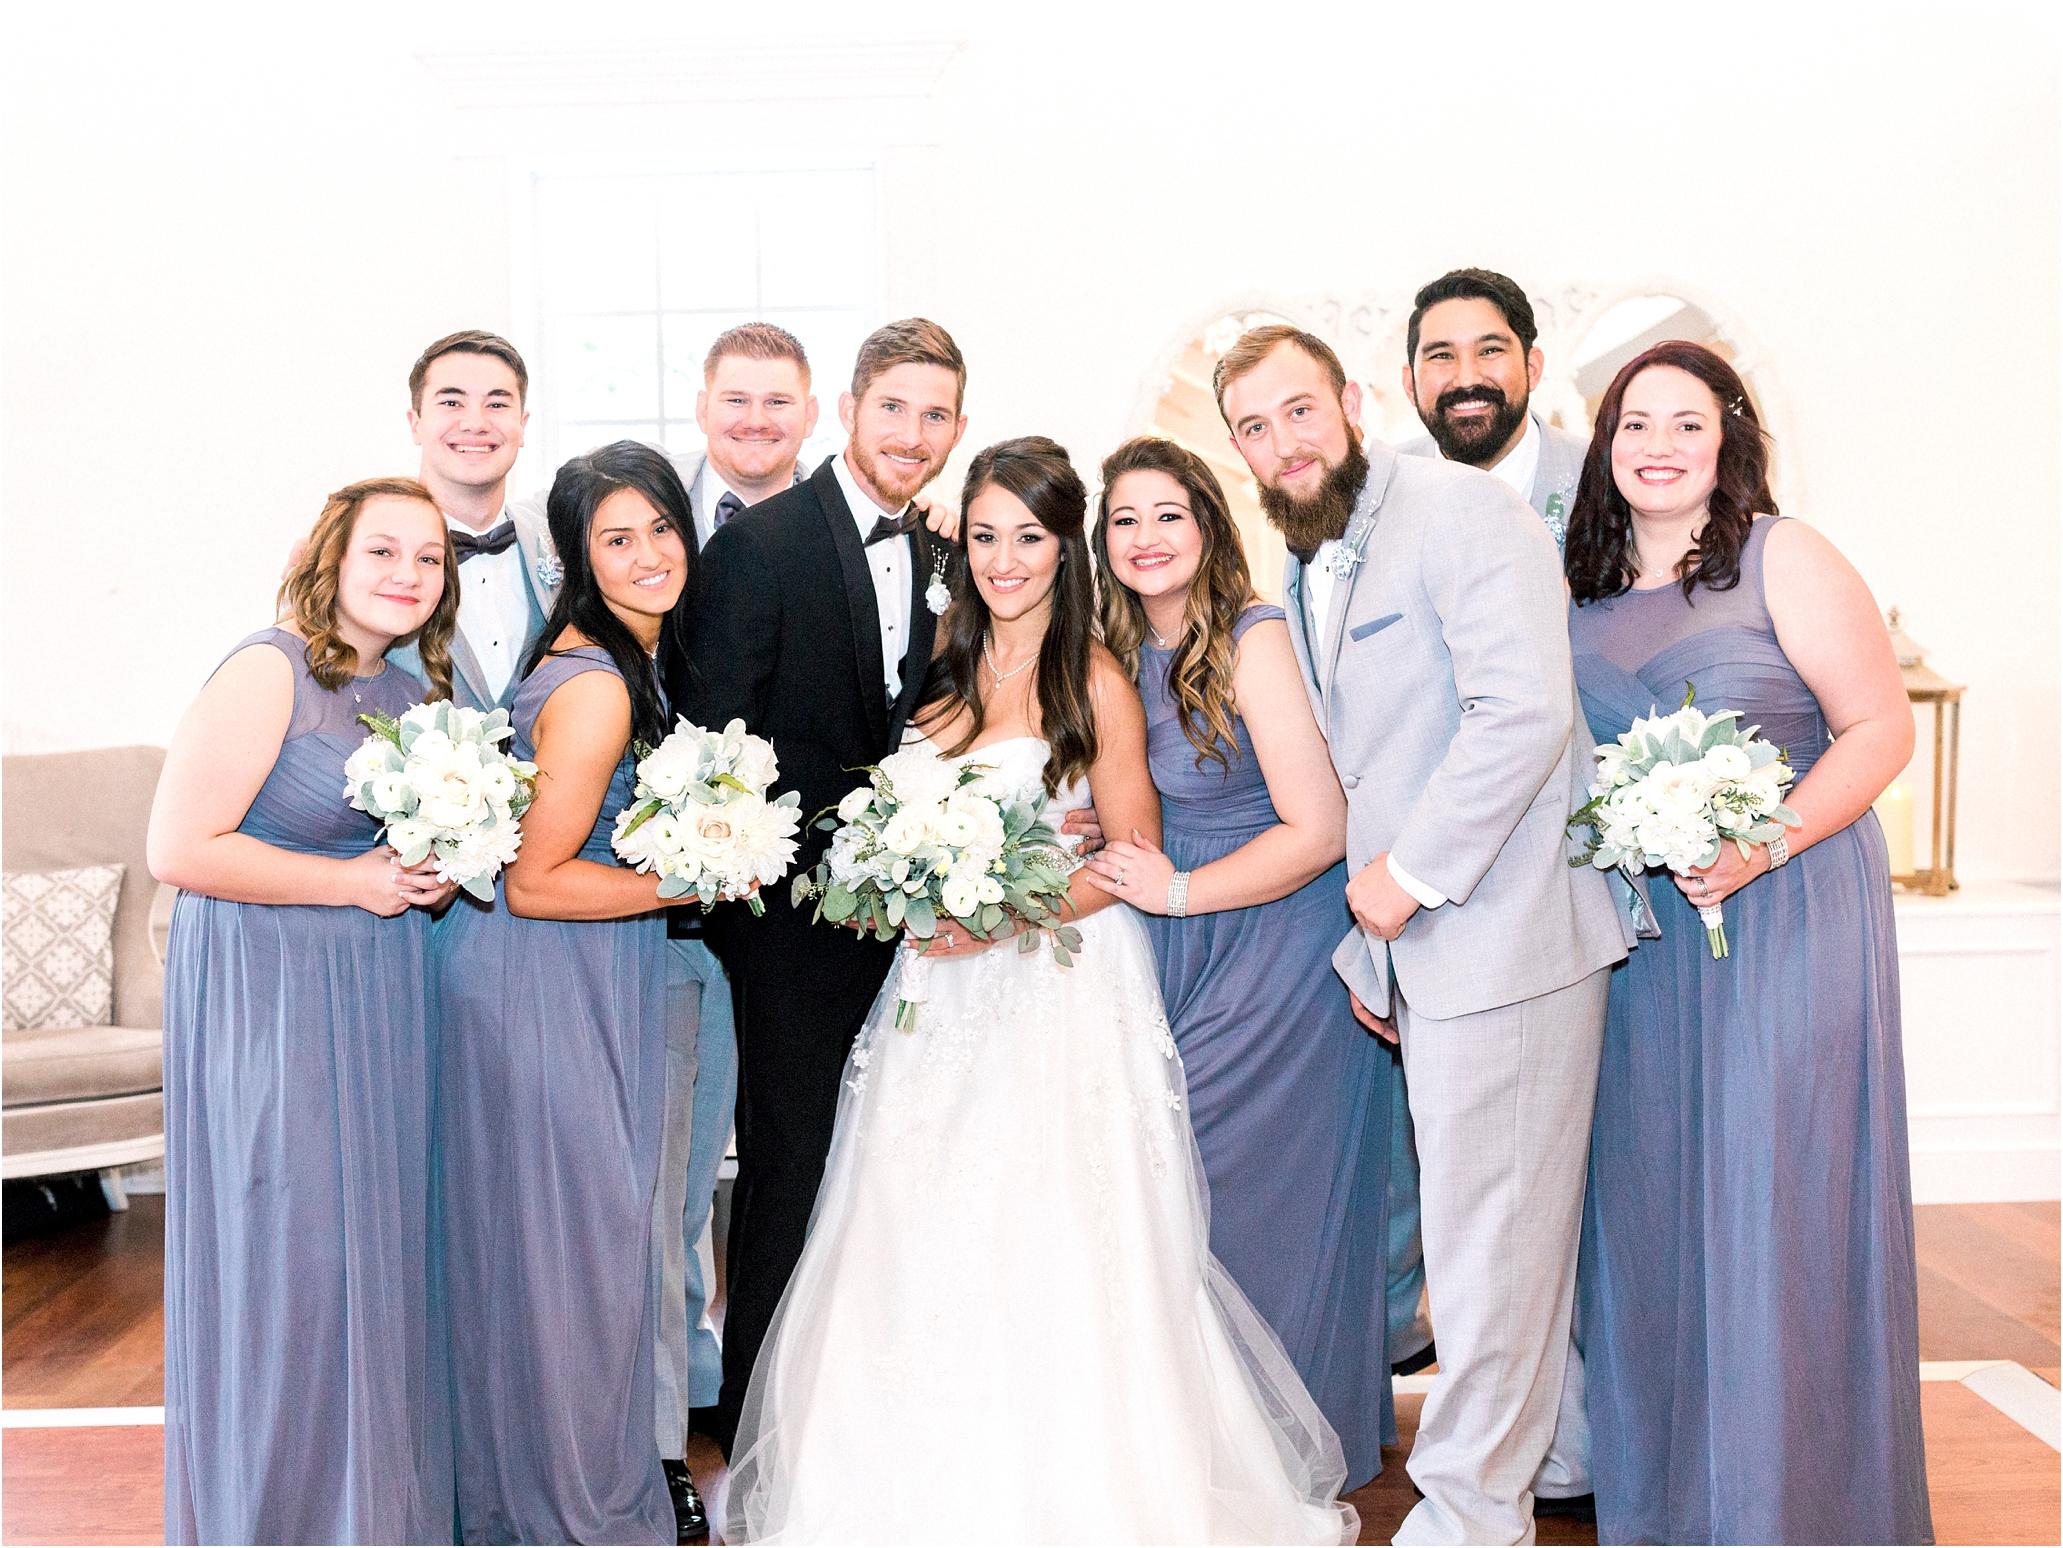 Lisa Silva Photography- Ponte Vedra Beach and Jacksonville, Florida Fine Art Film Wedding Photography- Wedding at The White Room Villa Blanca in St. Augustine, Florida_0055.jpg